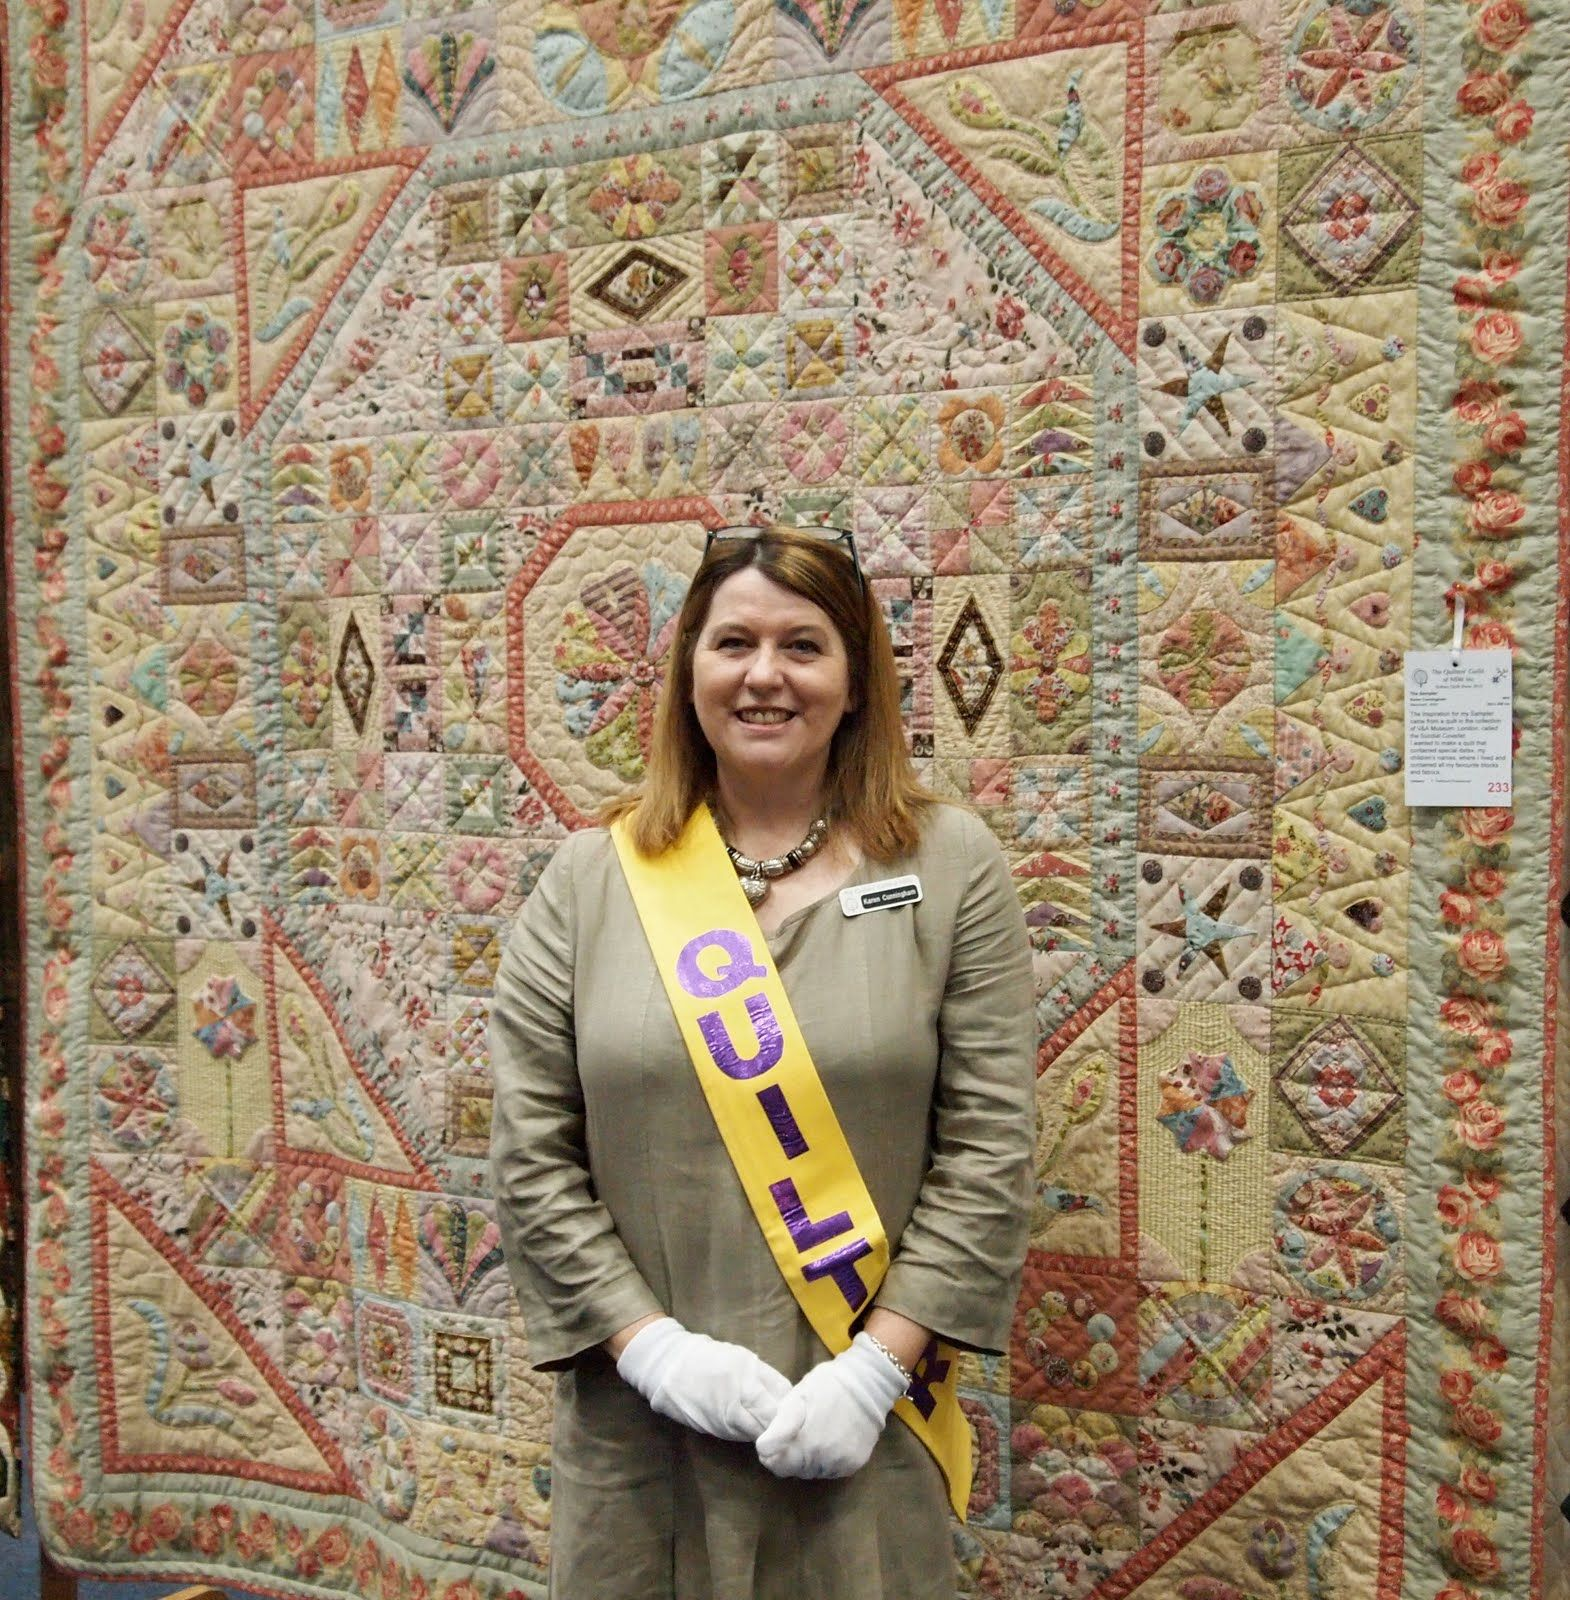 Patchwork On Stonleigh: Sydney quilt show, Karen Cunningham with ... : karen quilt - Adamdwight.com